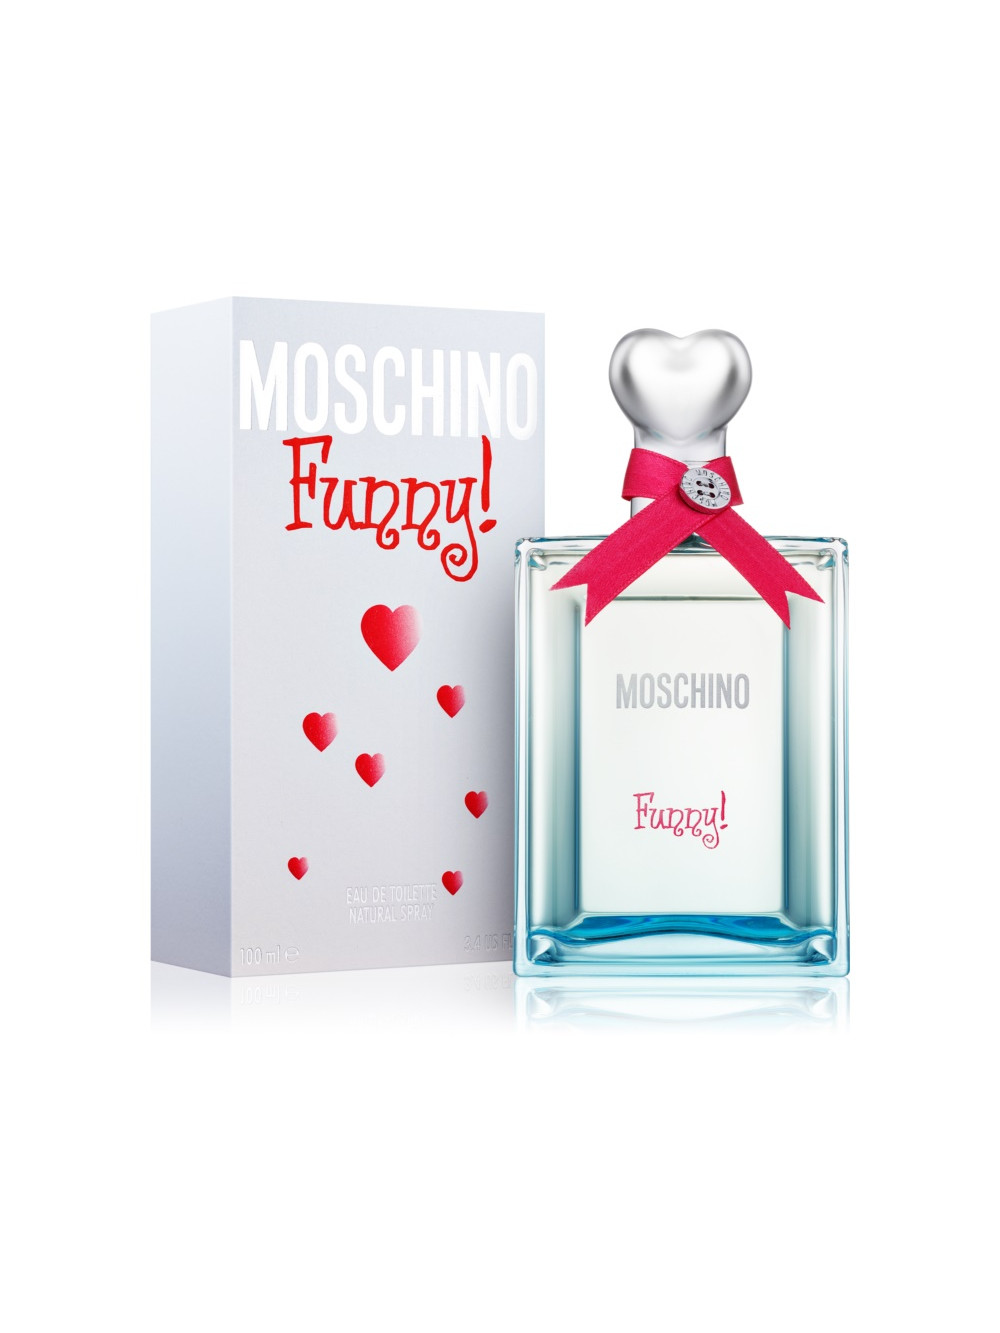 Funny Moschino Le Parfum